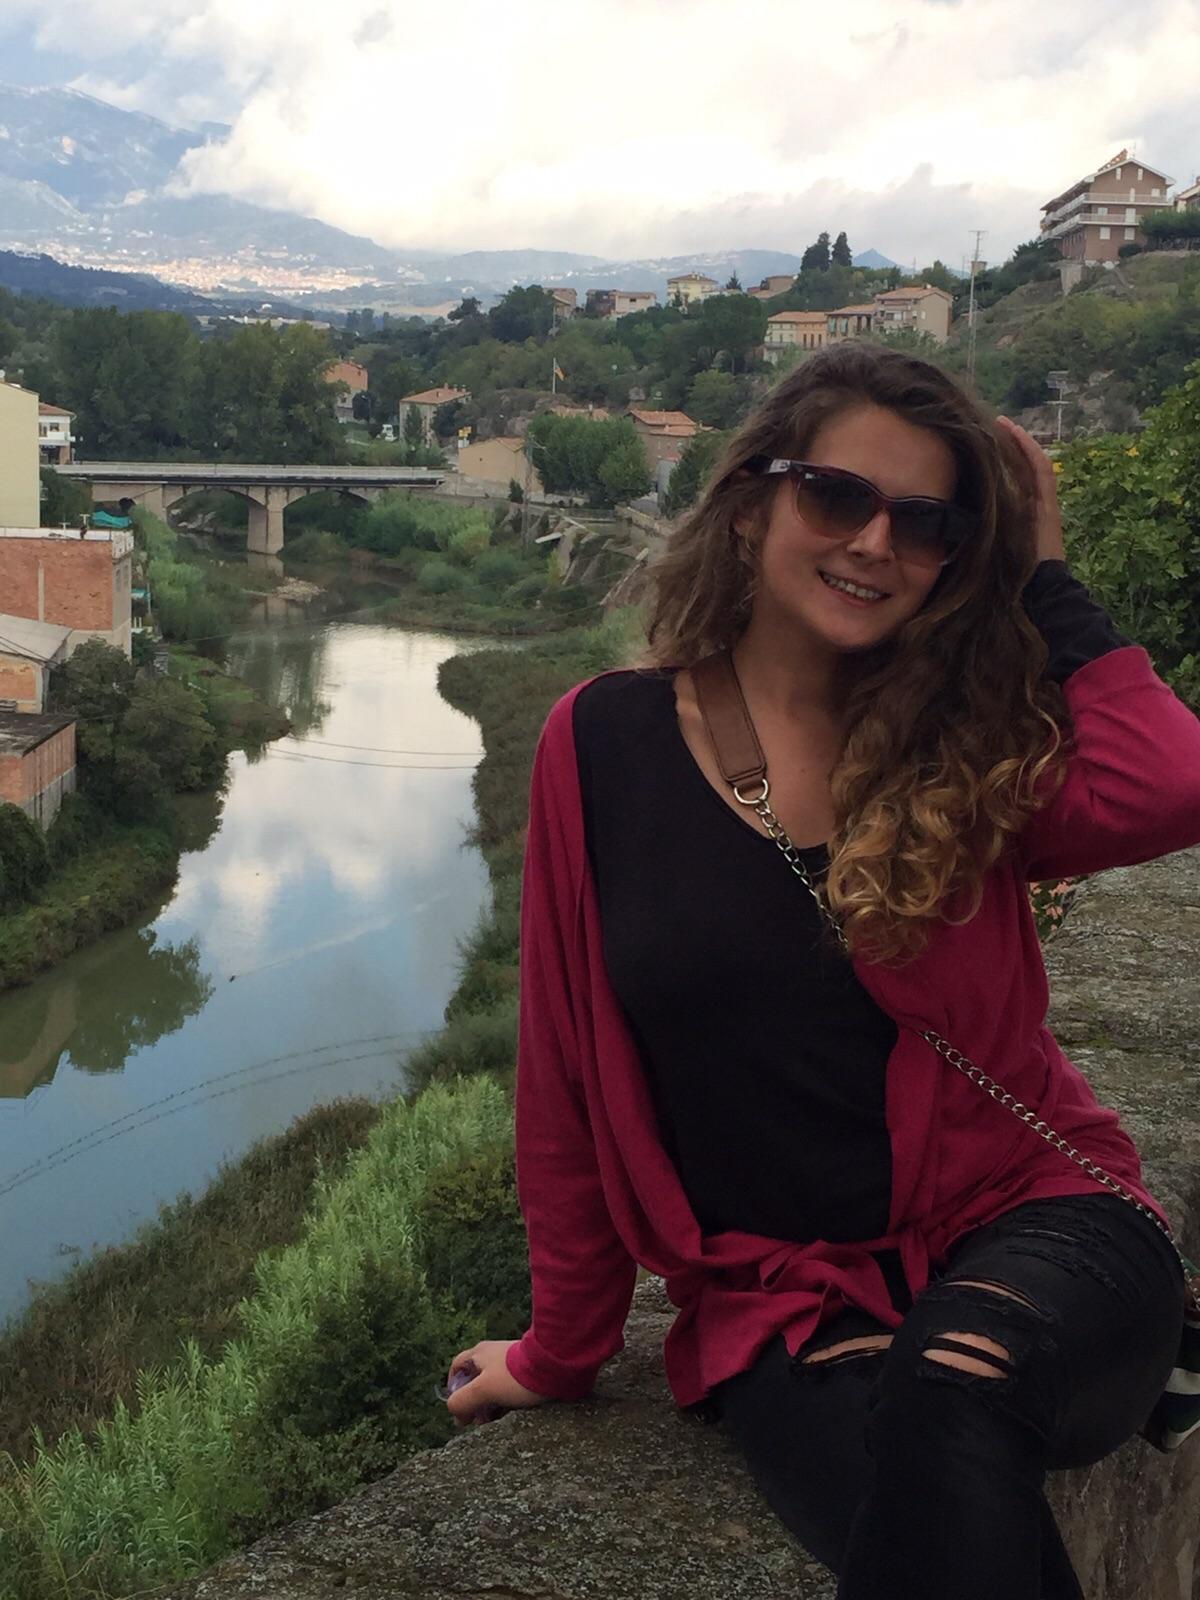 Частный гид экскурсовод по Барселоне Дарья